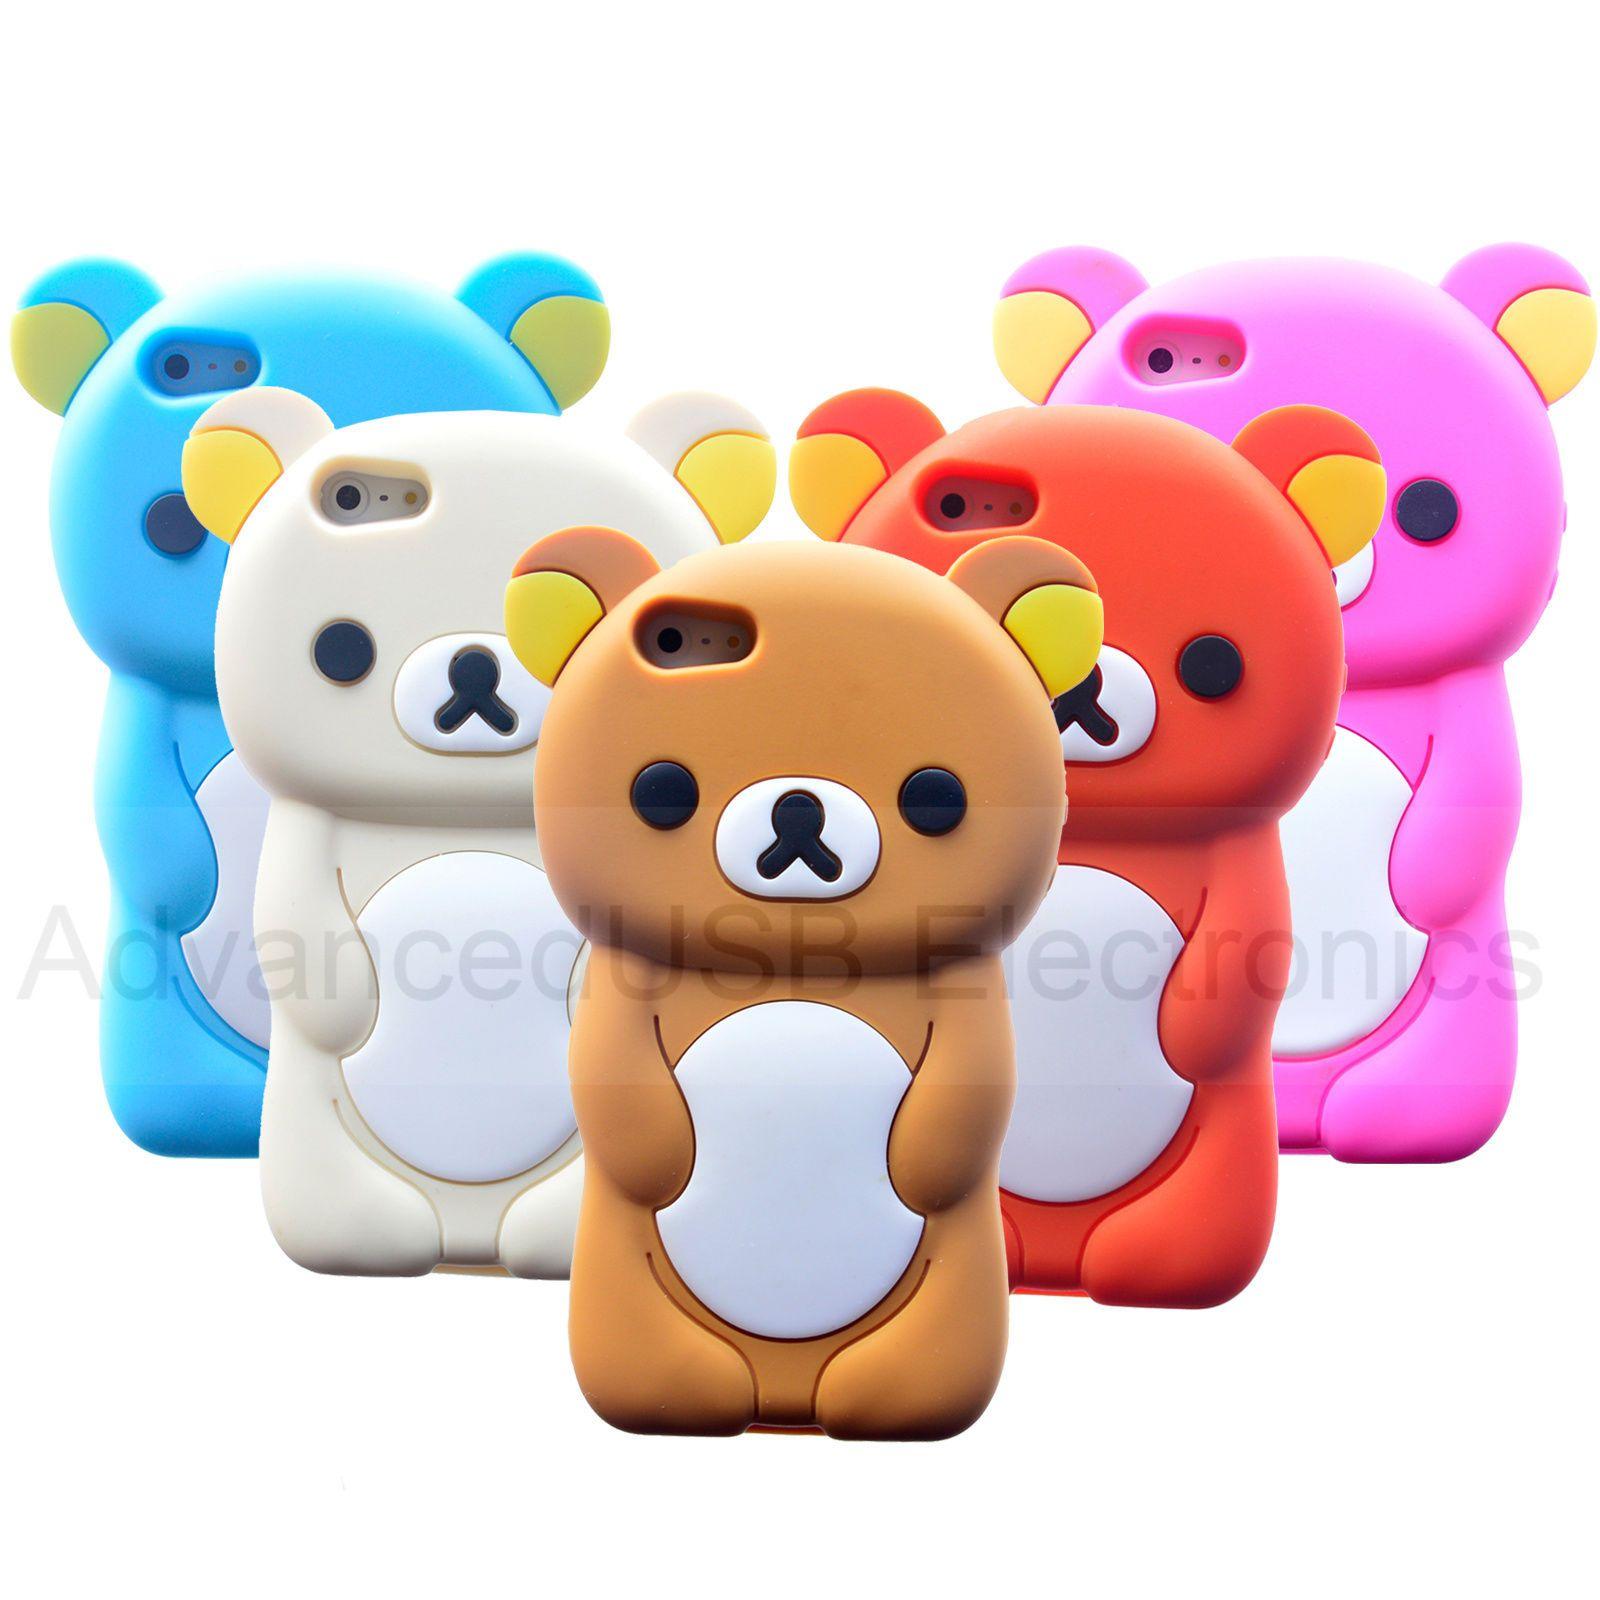 3D Rilakkuma Bear Mobile Phone Cover For Apple Iphone 5 5S 4S Soft ...